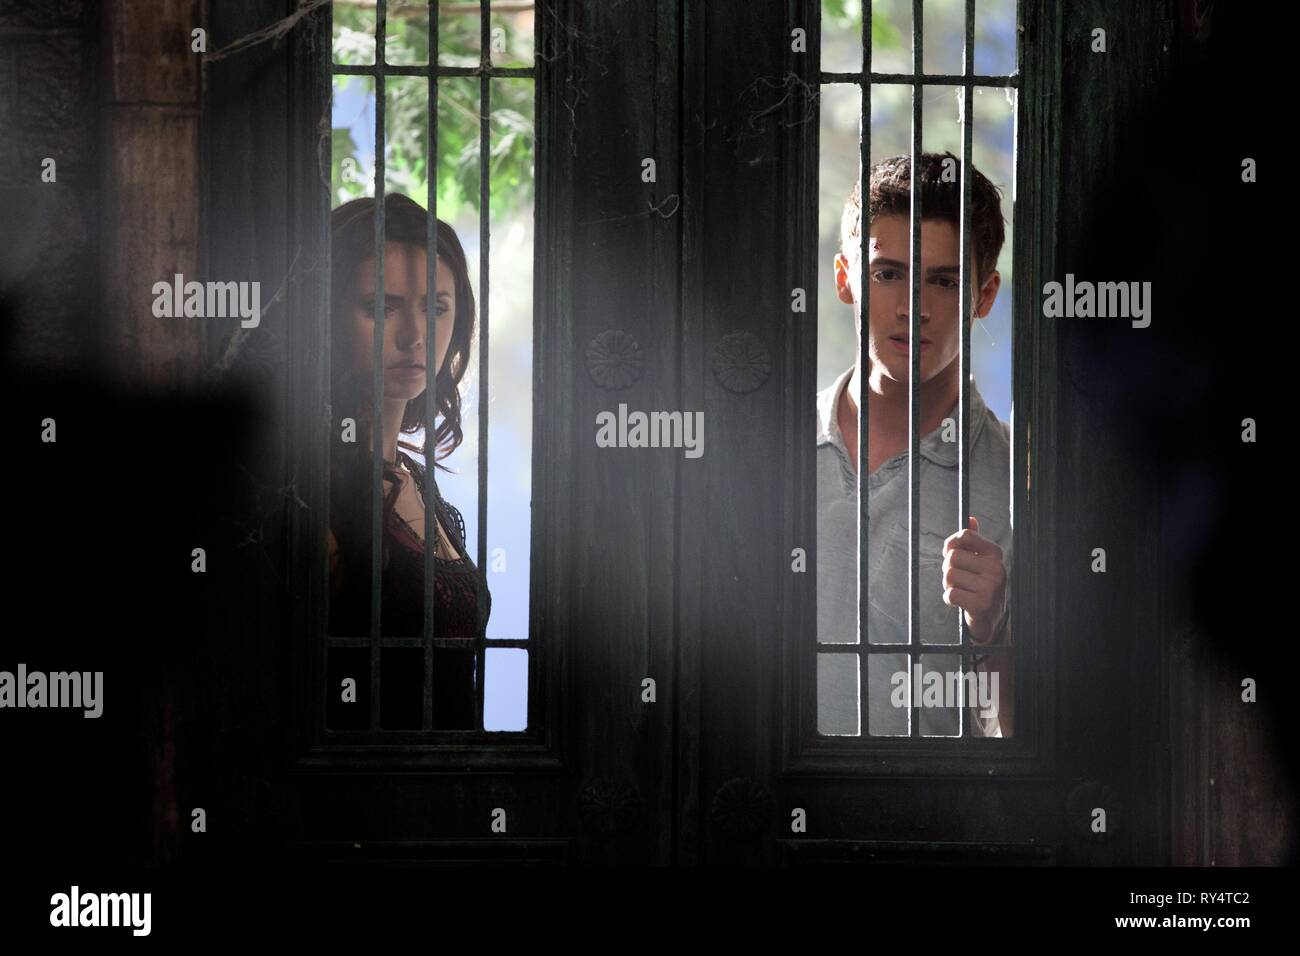 The Vampire Diaries Stock Photos & The Vampire Diaries Stock Images